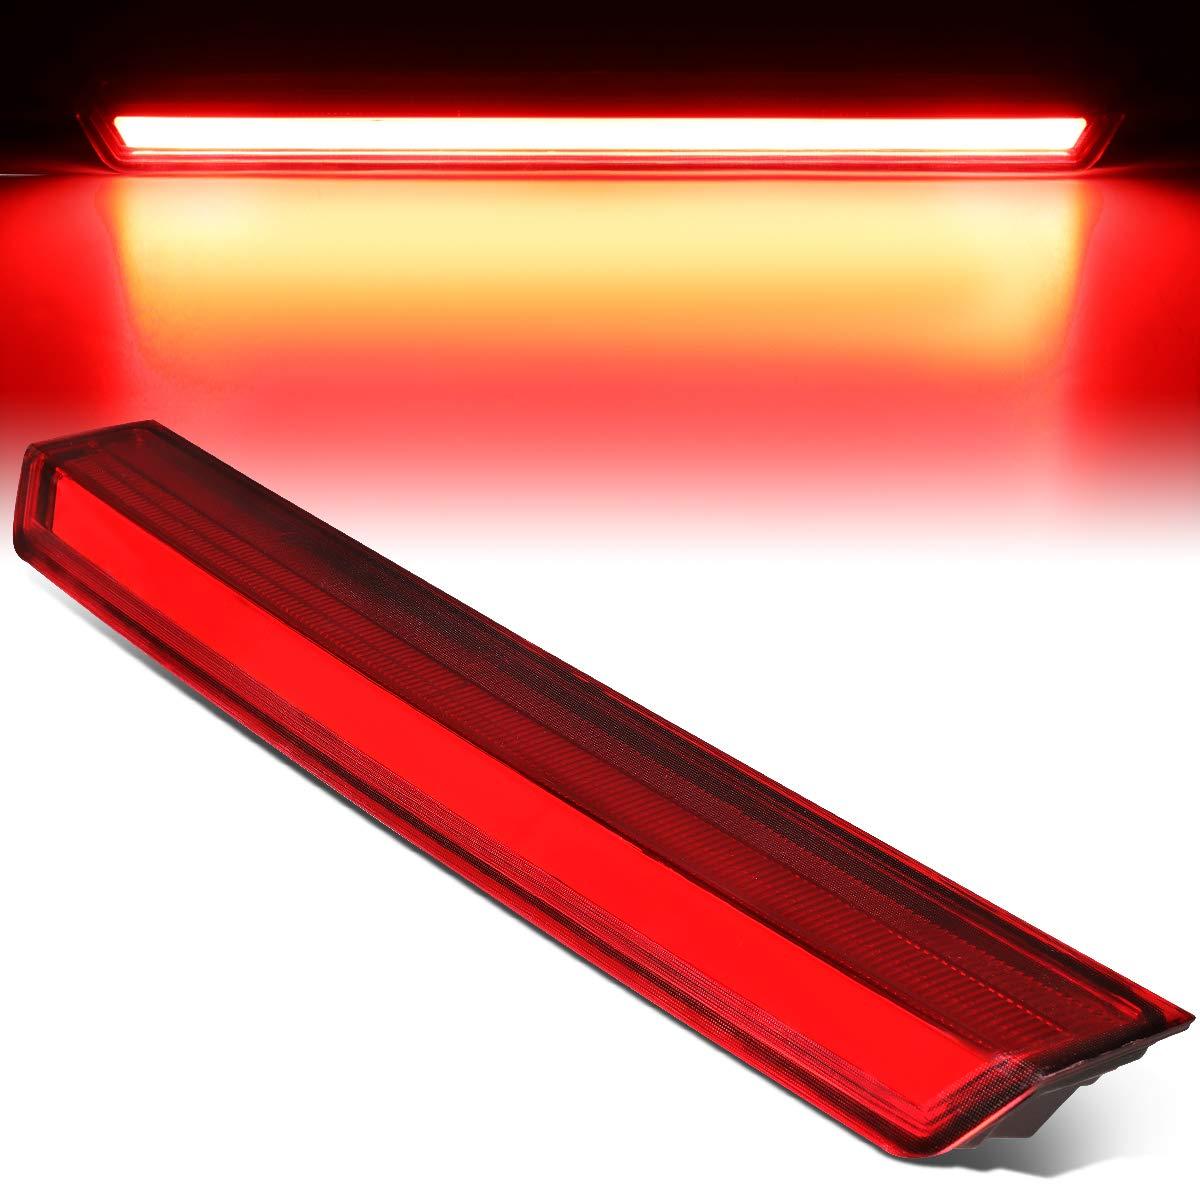 Rear Center 3D LED Bar Third 3rd Tail Brake Light Lamp for Chevy Suburban Tahoe 15-20 Red